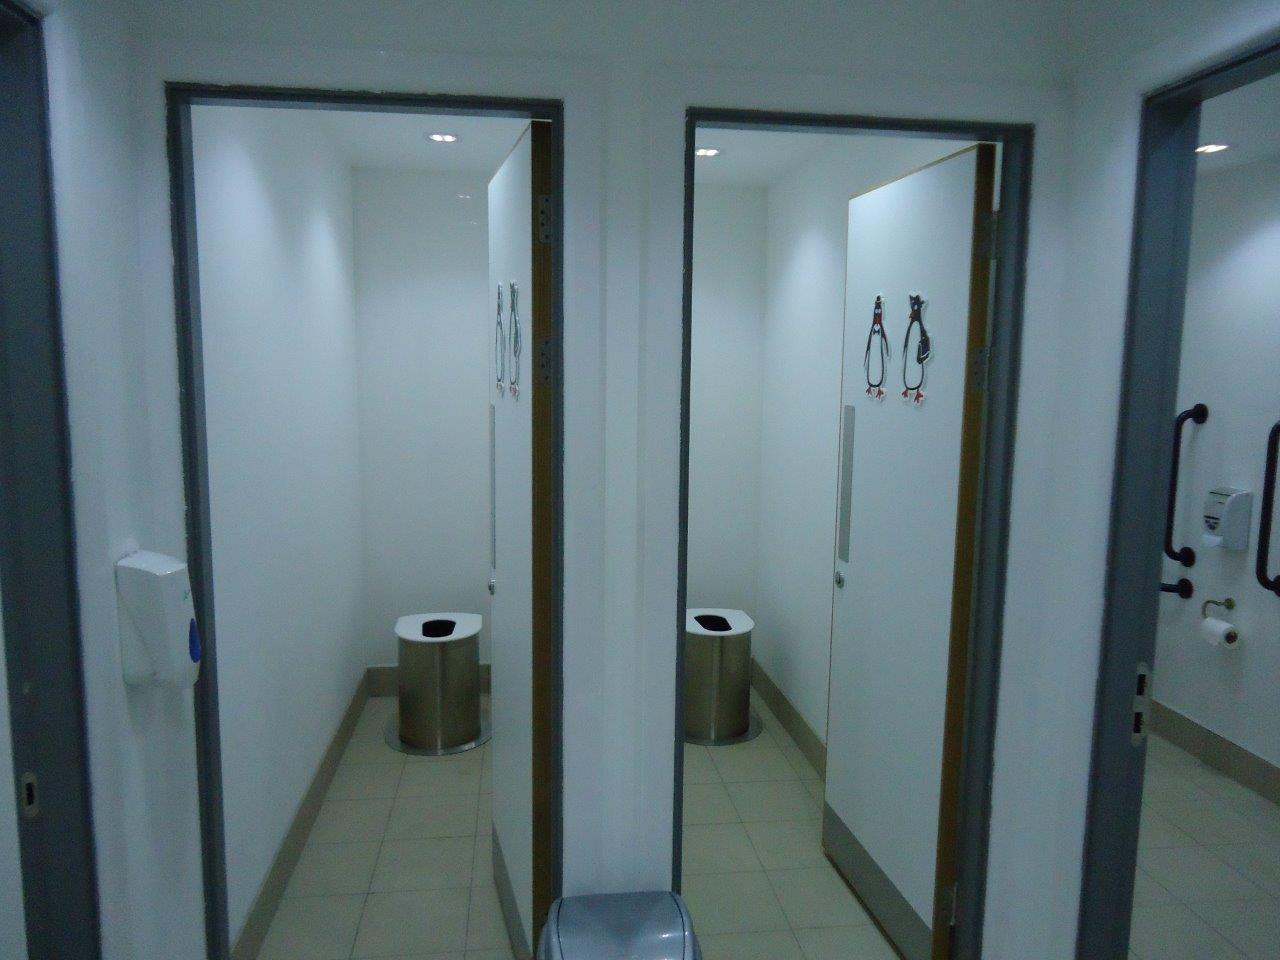 Zero Discharge toilets in the South Atlantic